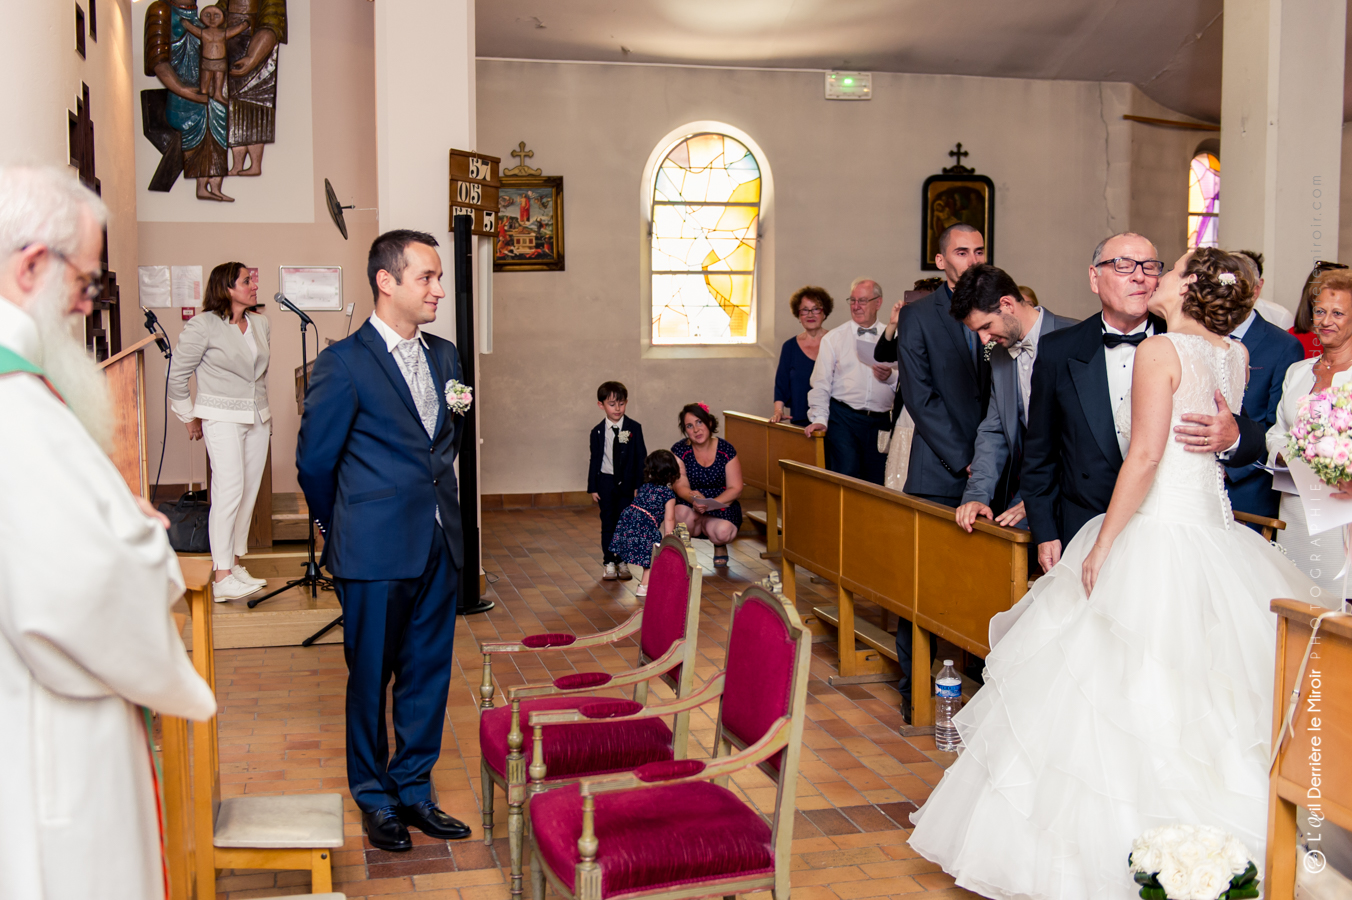 mariage-cj-vaugrenier-loeilderrierelemiroir-038